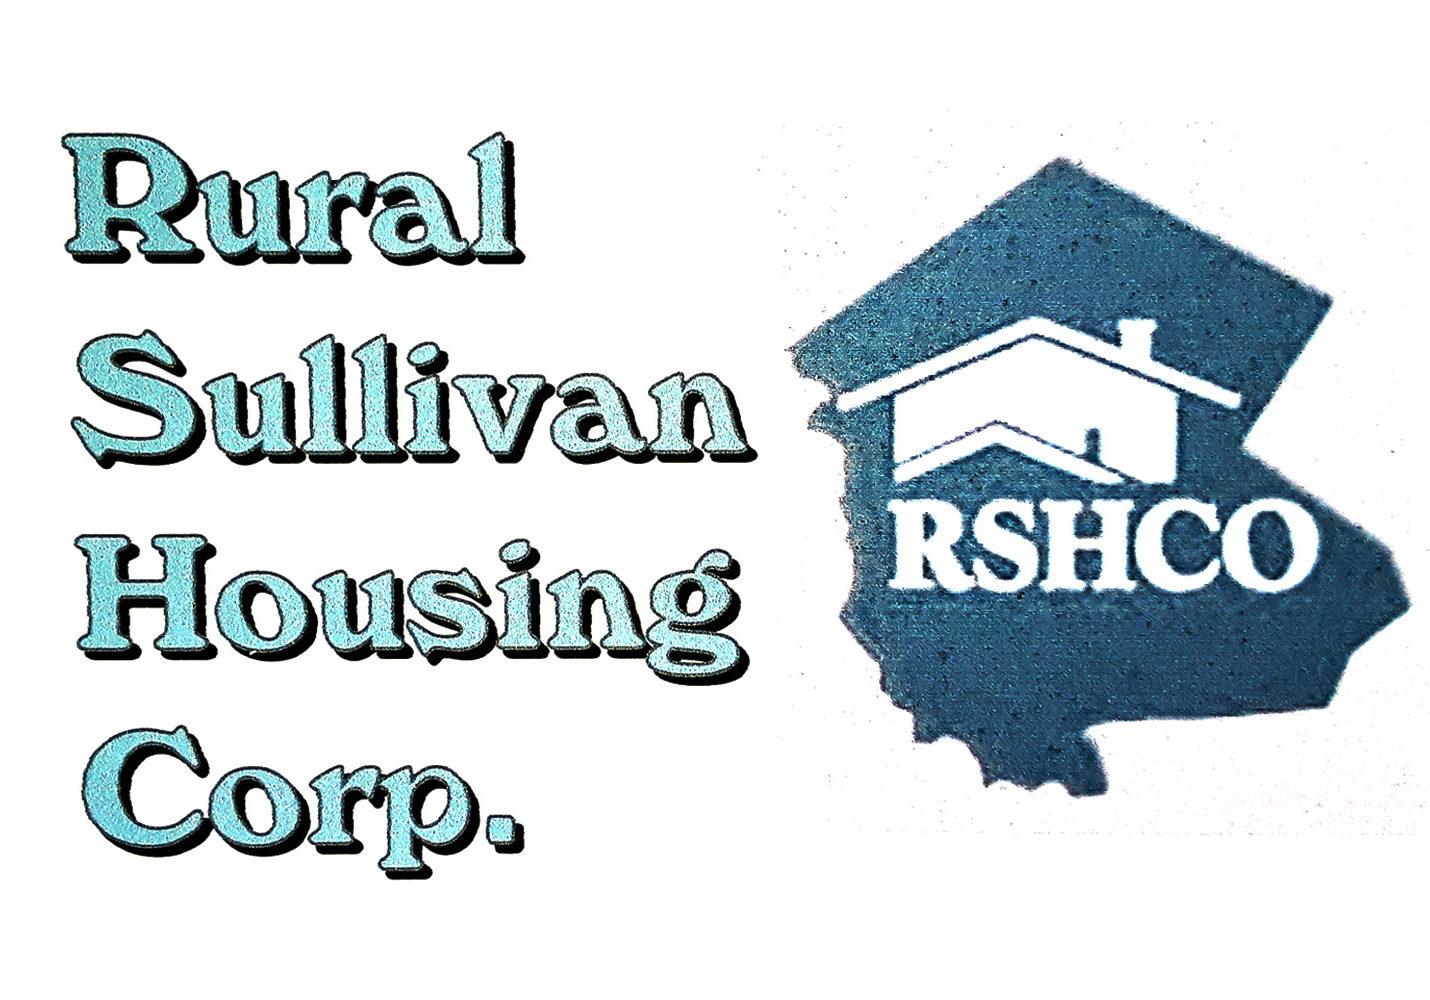 Rural Sullivan Housing Corp